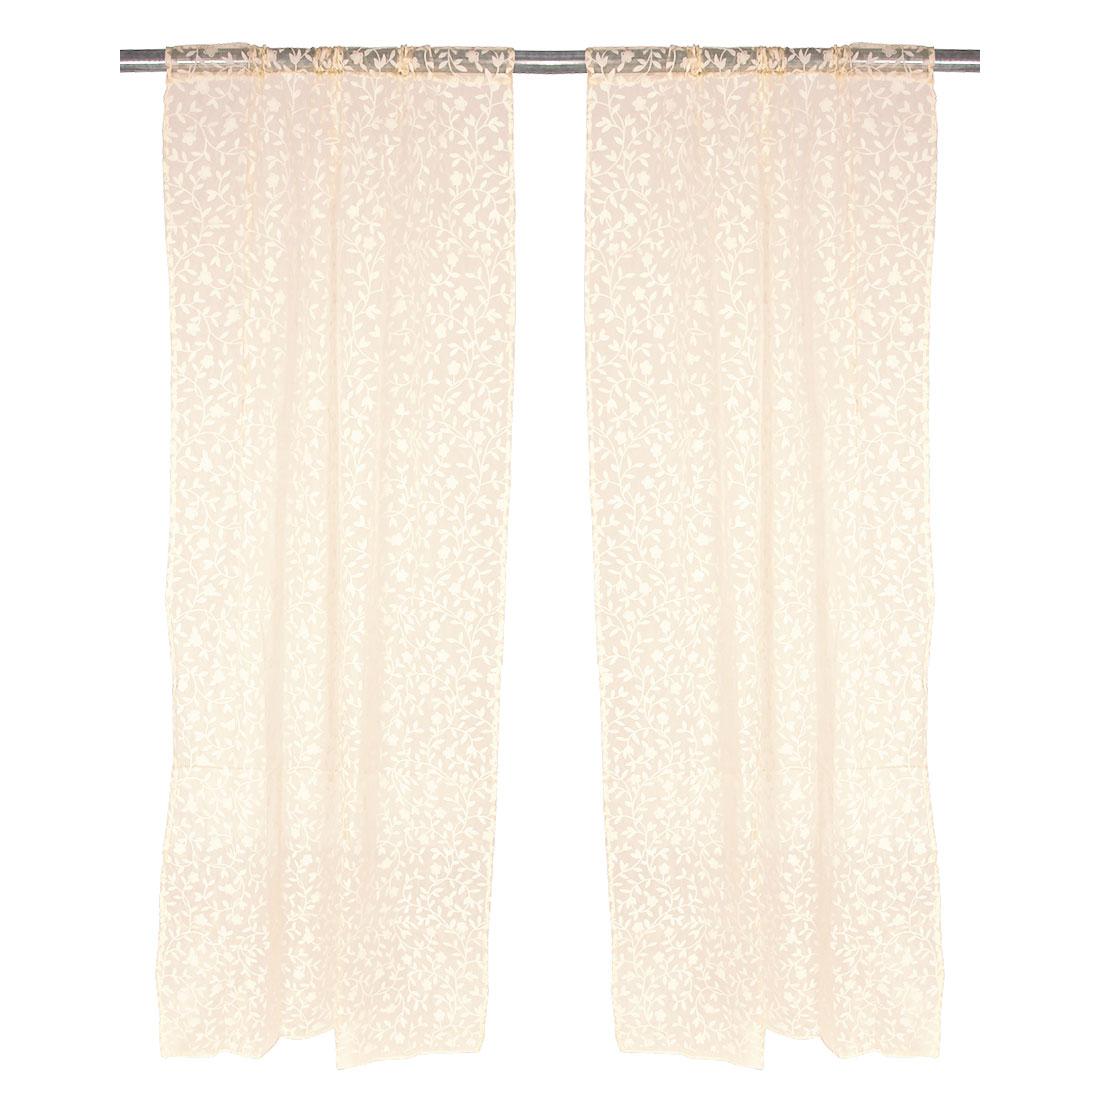 Door Polyester Leaves Pattern Screen Window Sheer Curtain Beige 100 x 200cm